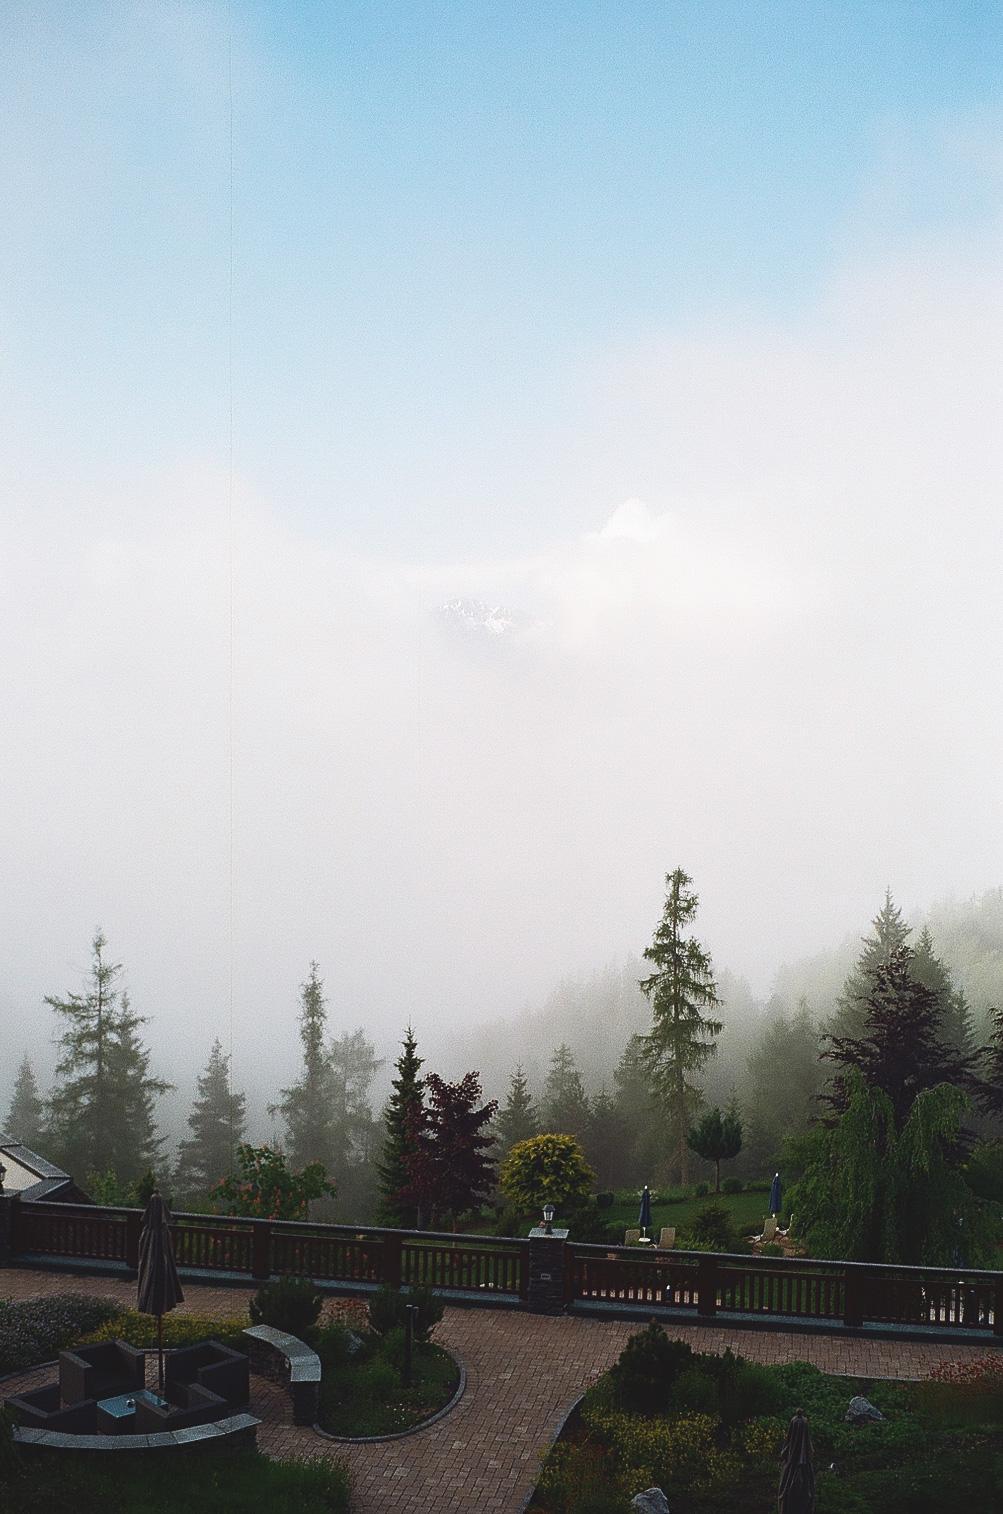 Seefeld Interalpen panorama hochkant